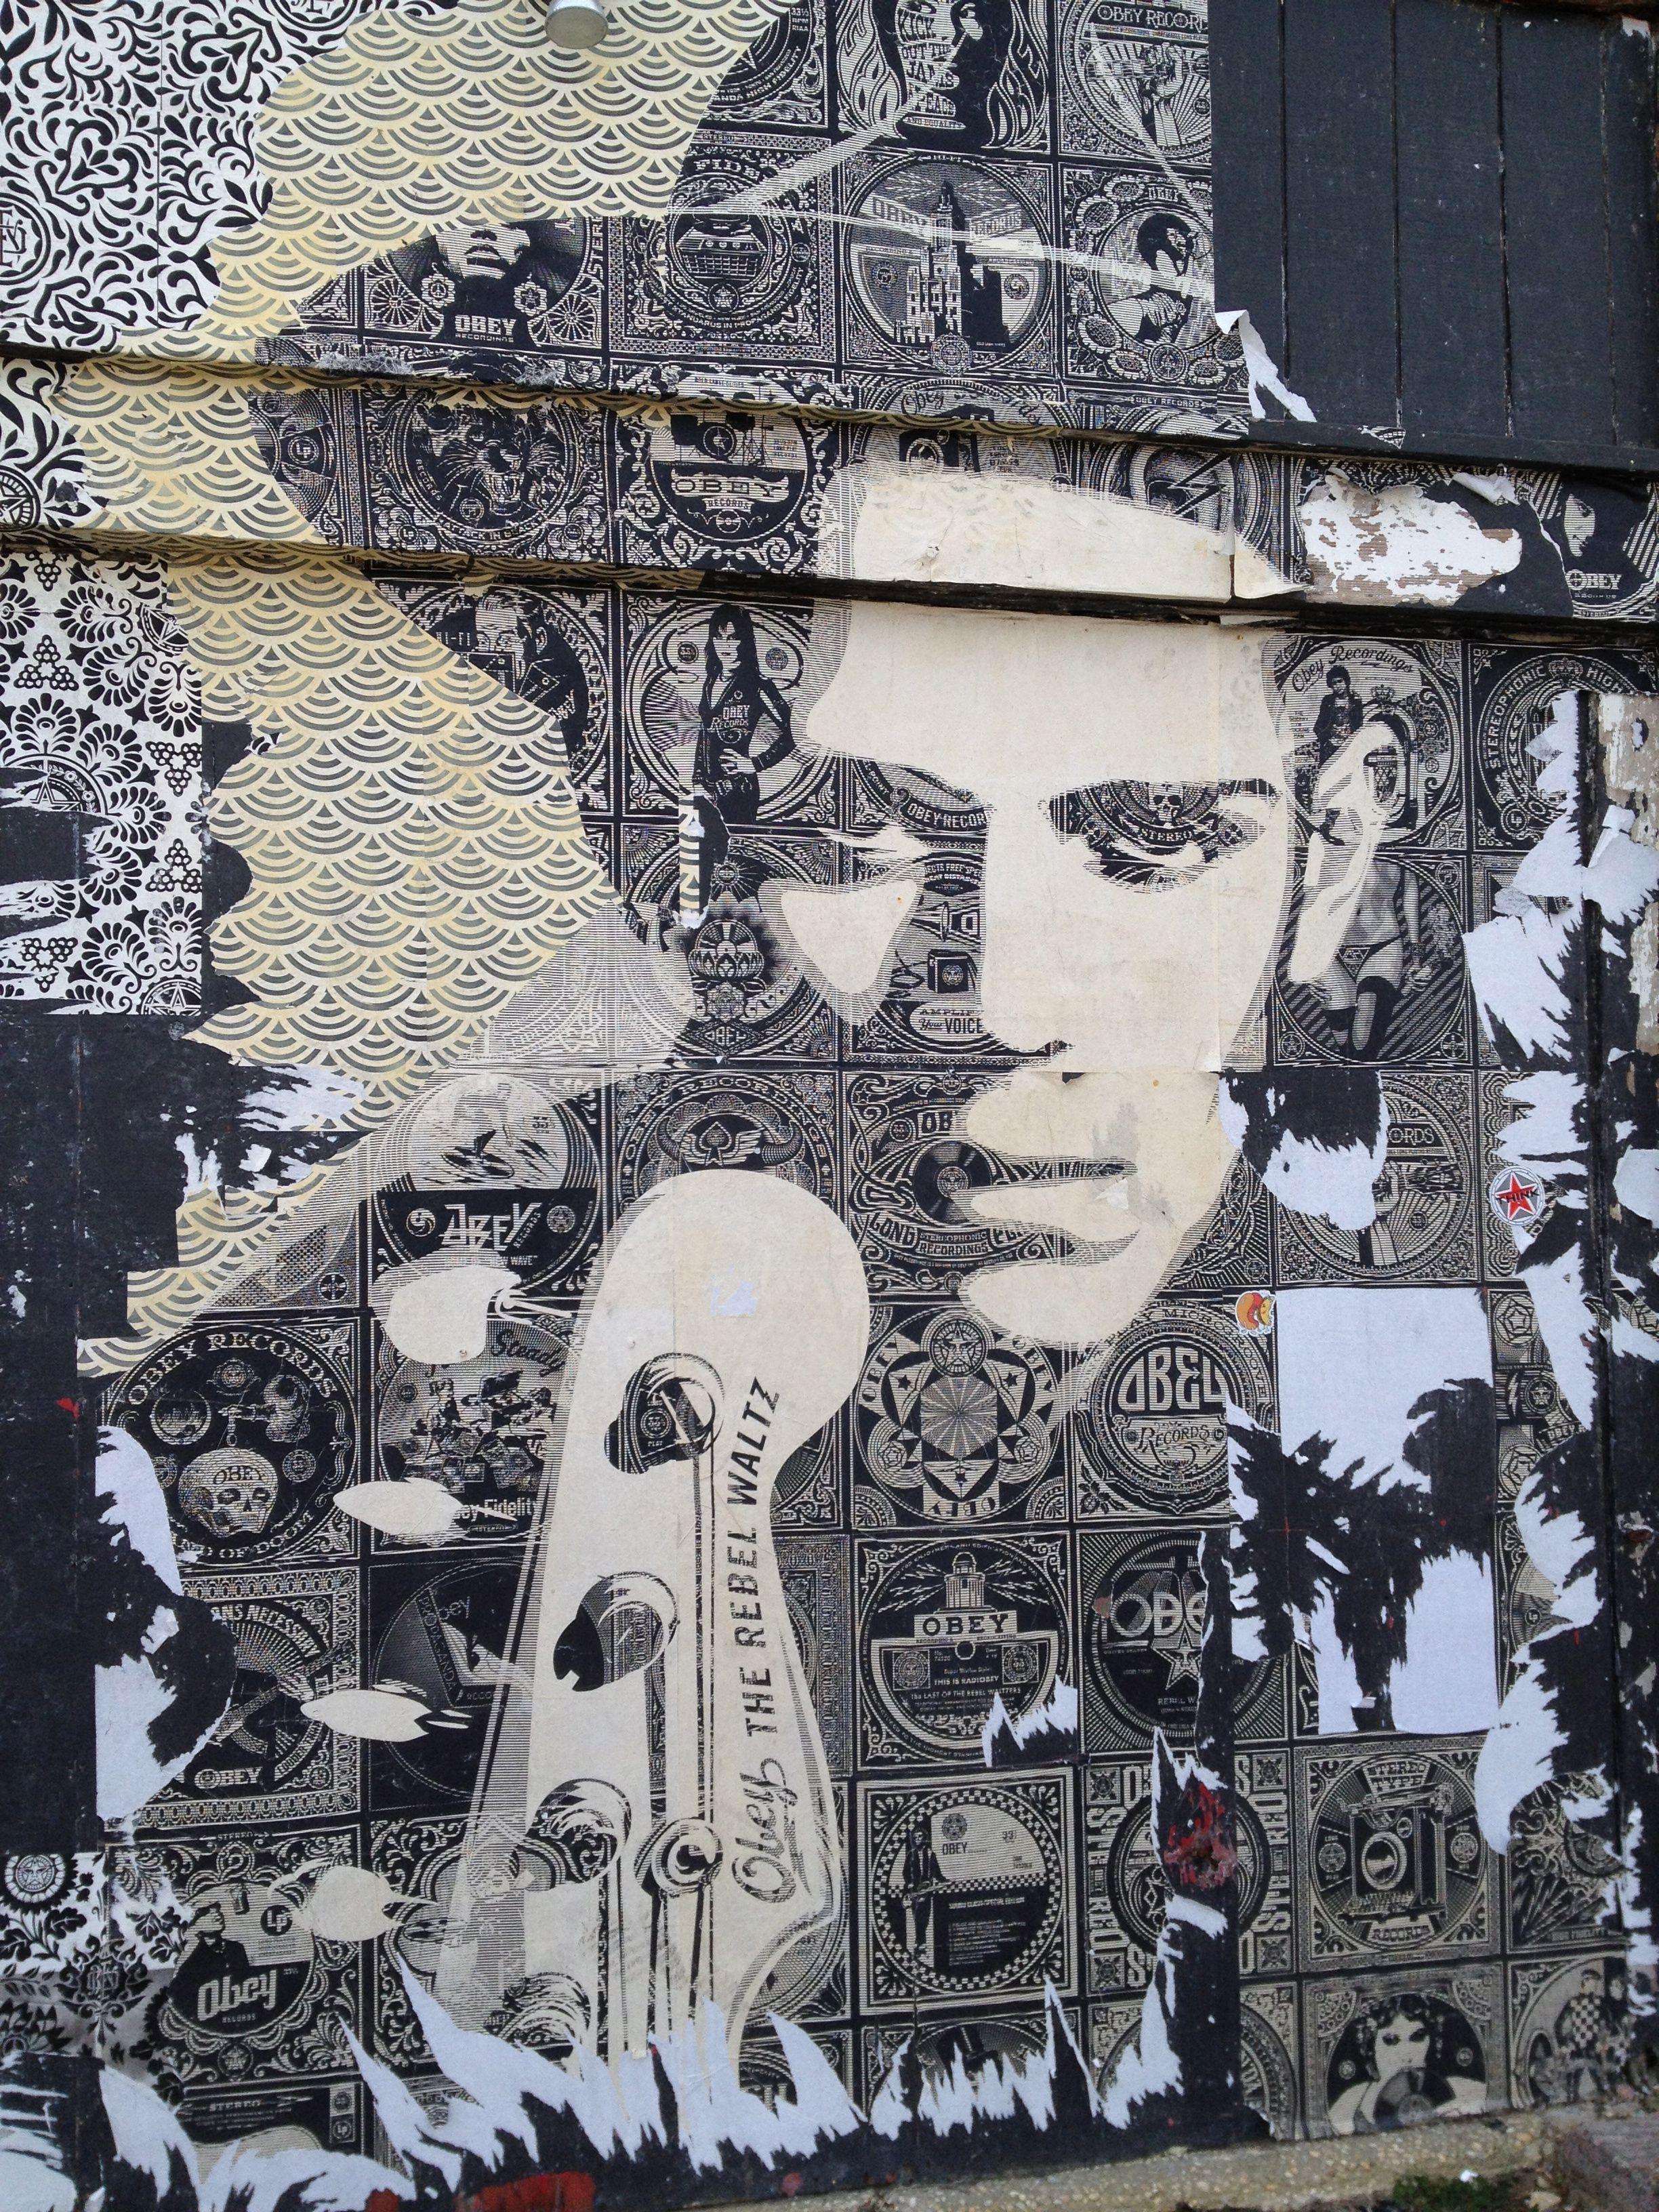 Street art, male, hat, man, surreal, instrument, wall, beautiful, photo.